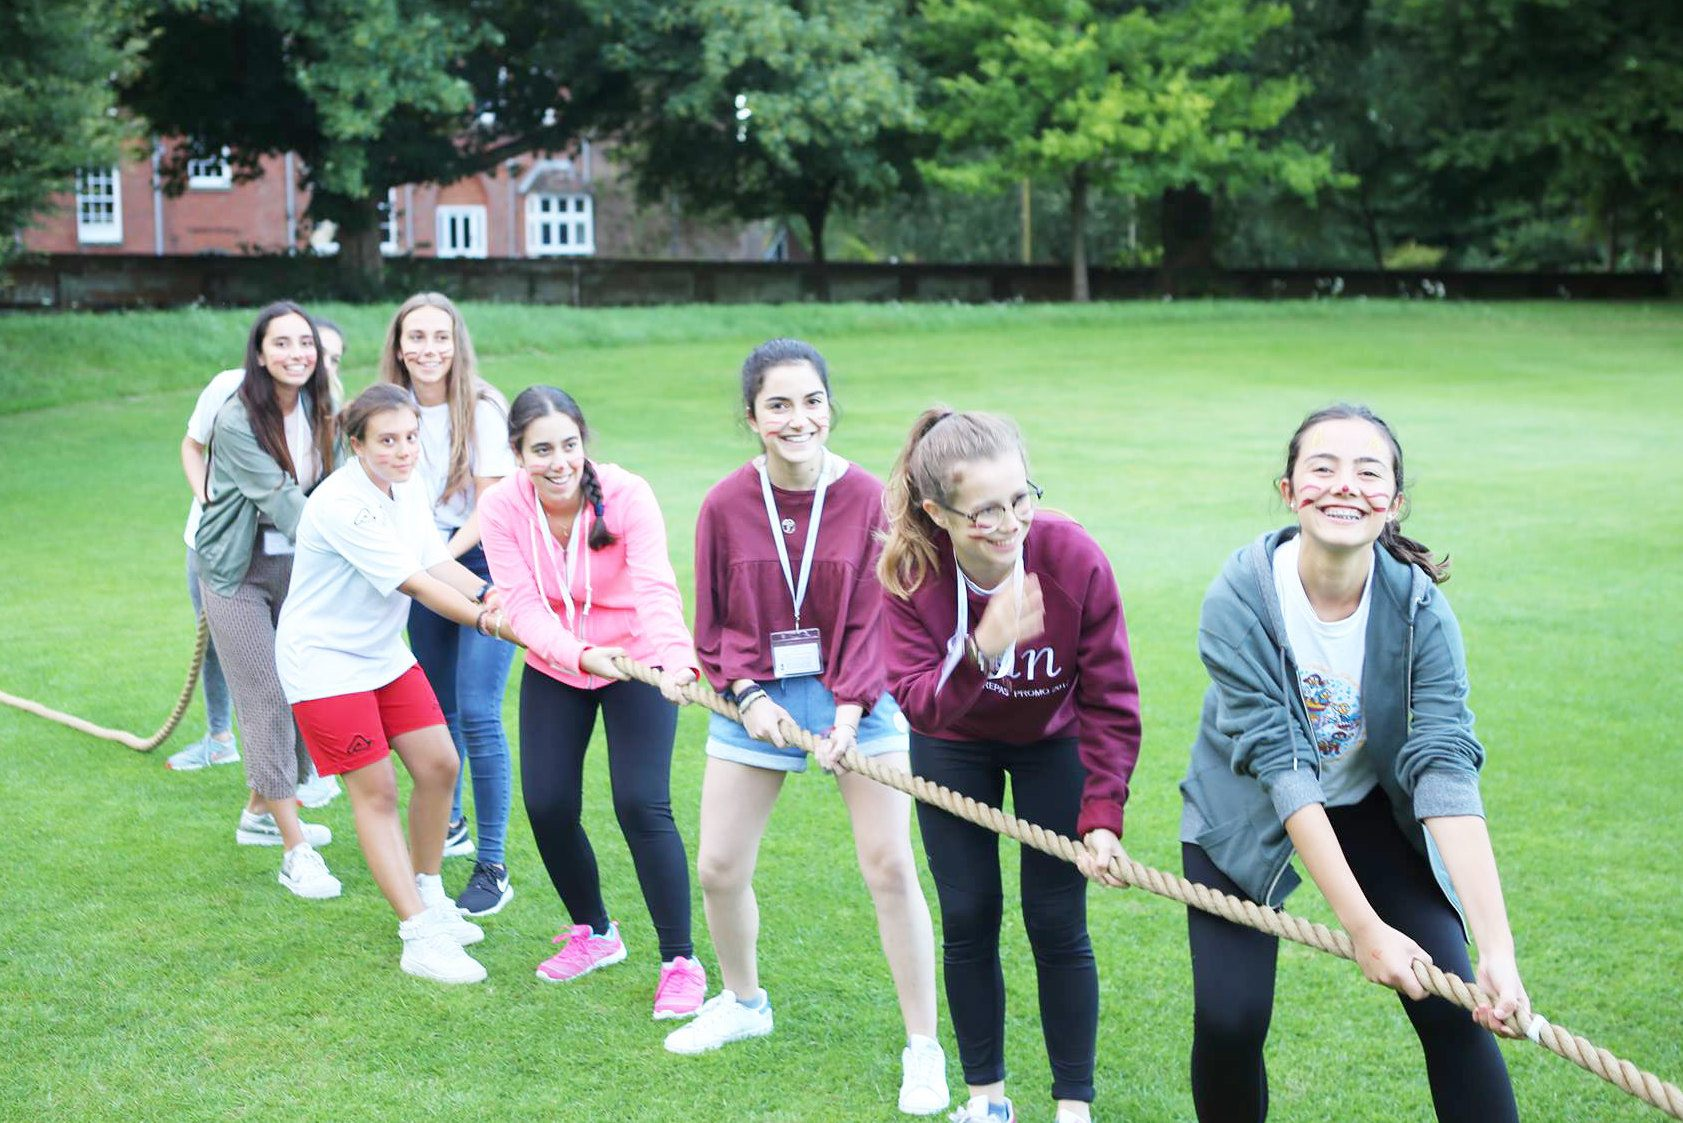 Activities summer camp England